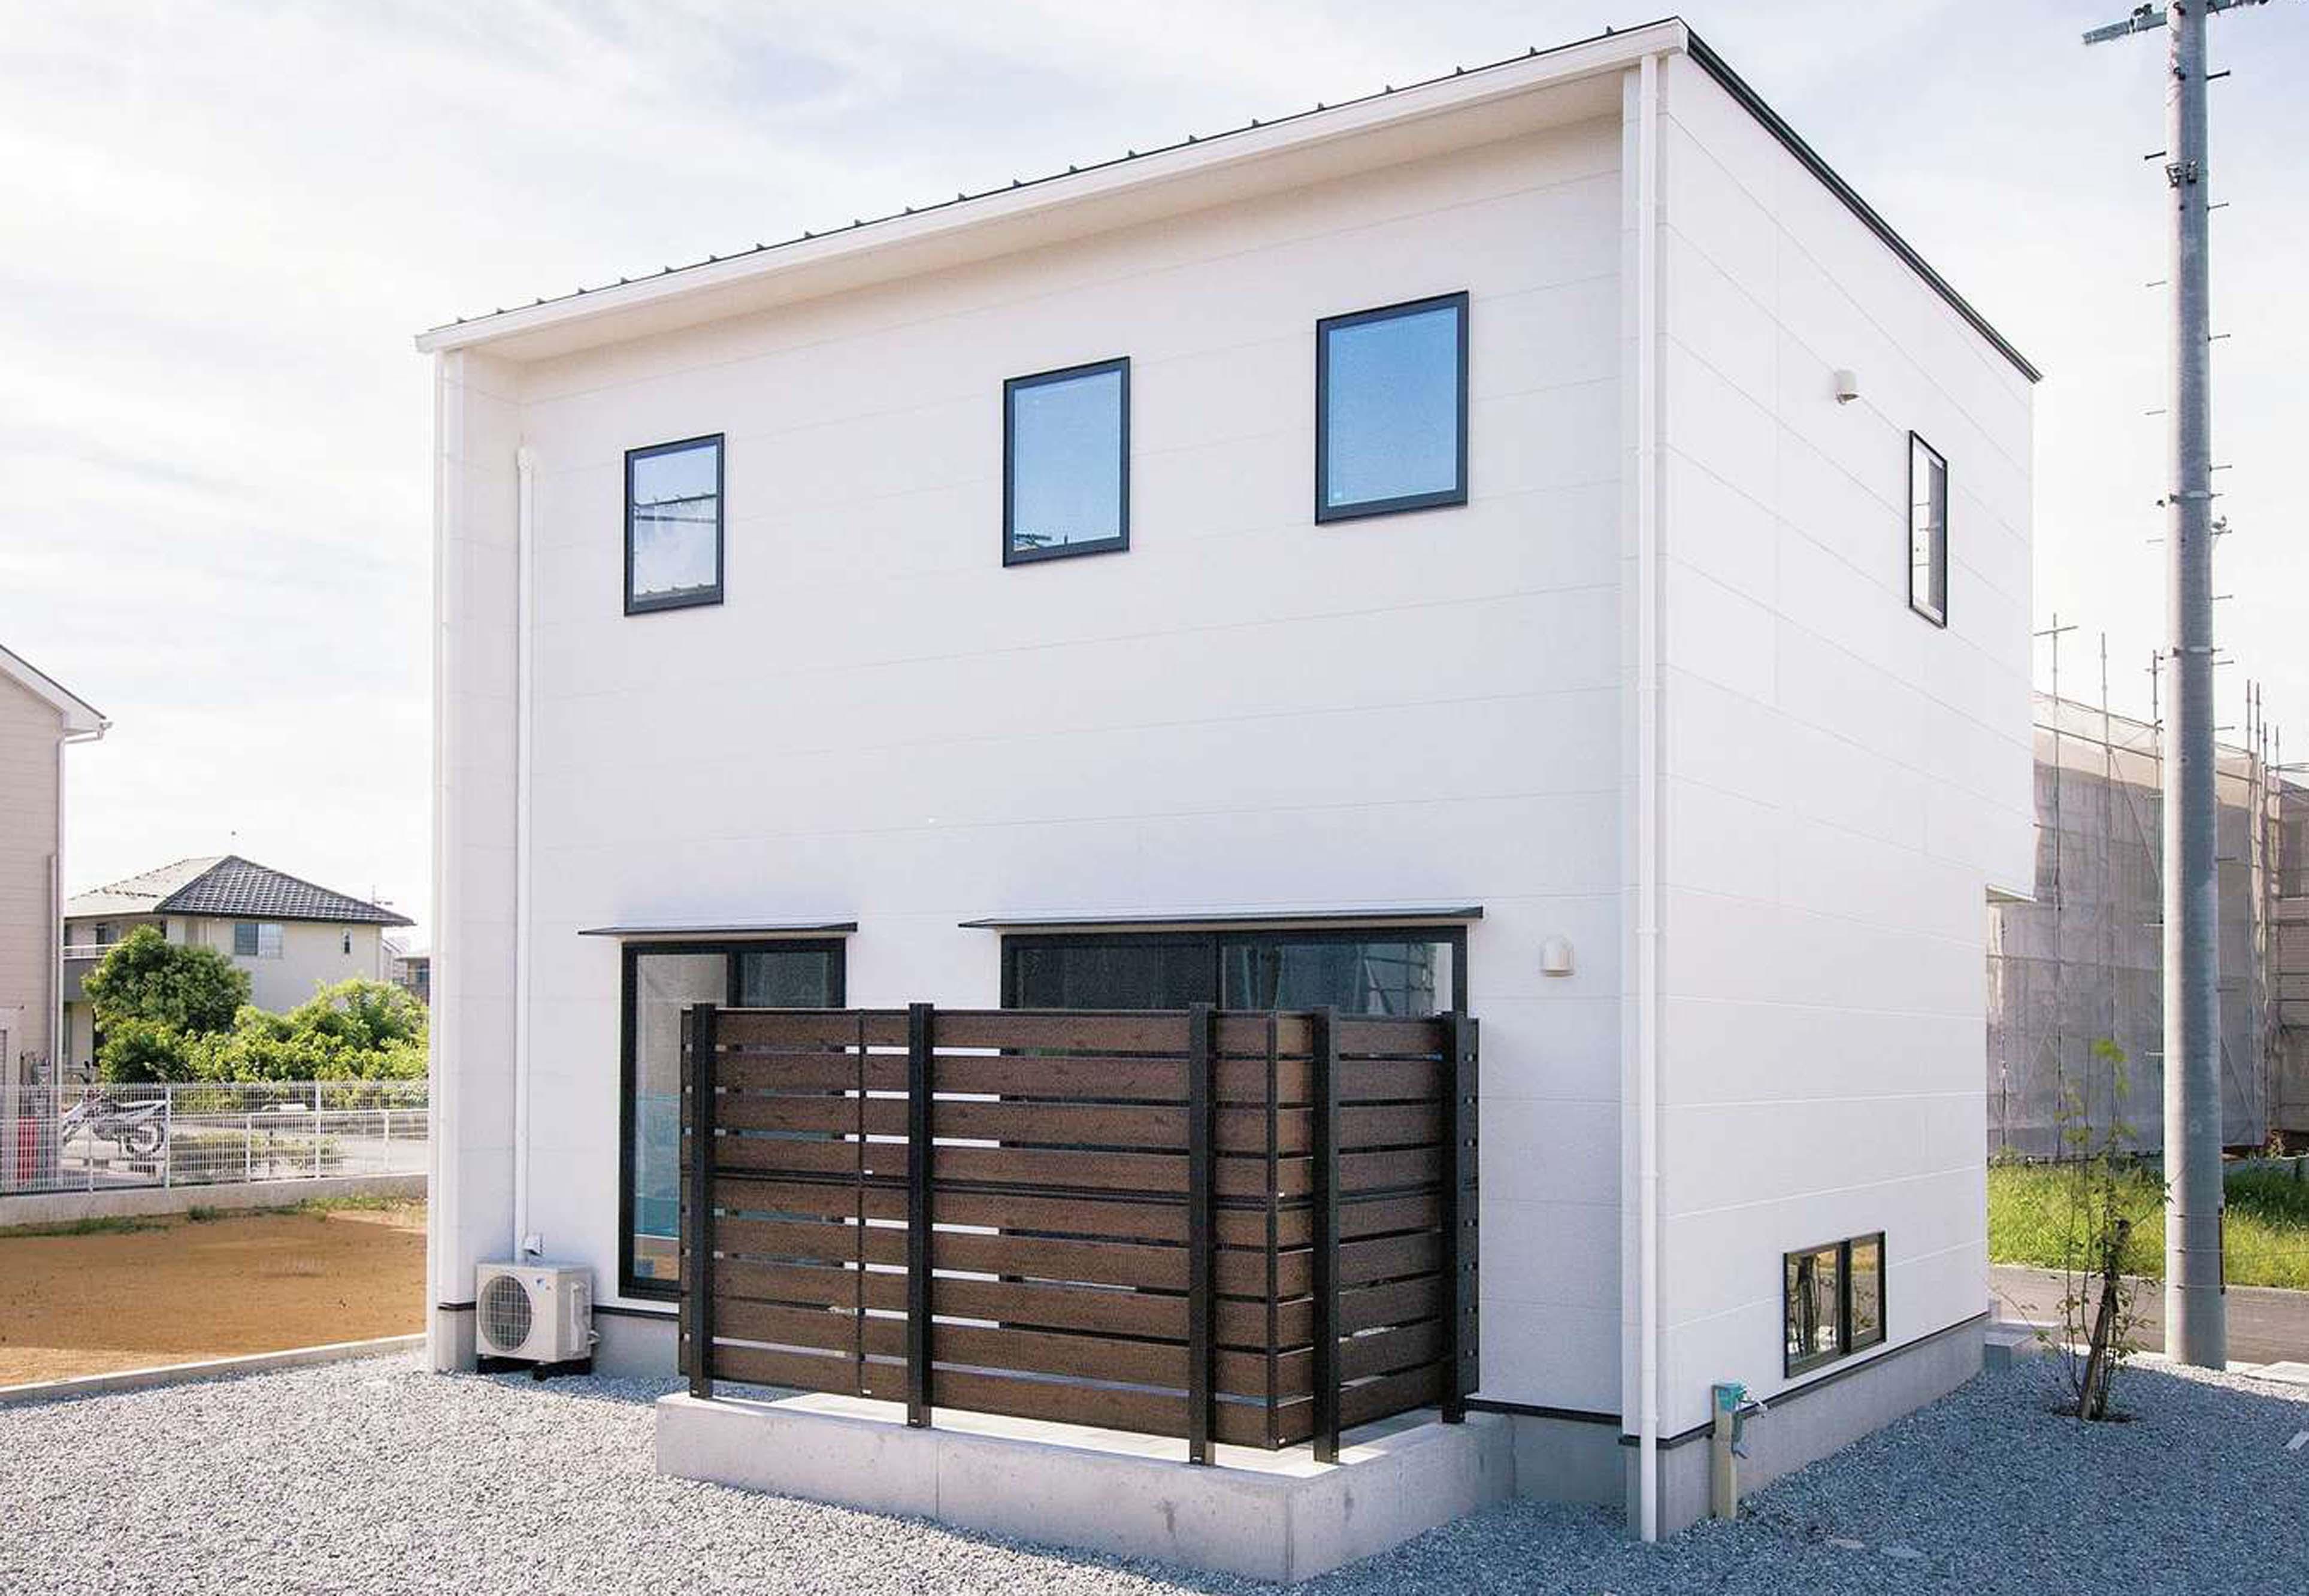 R+house 浜松中央(西遠建設)【デザイン住宅、子育て、建築家】キューブ型のシンプルな外観